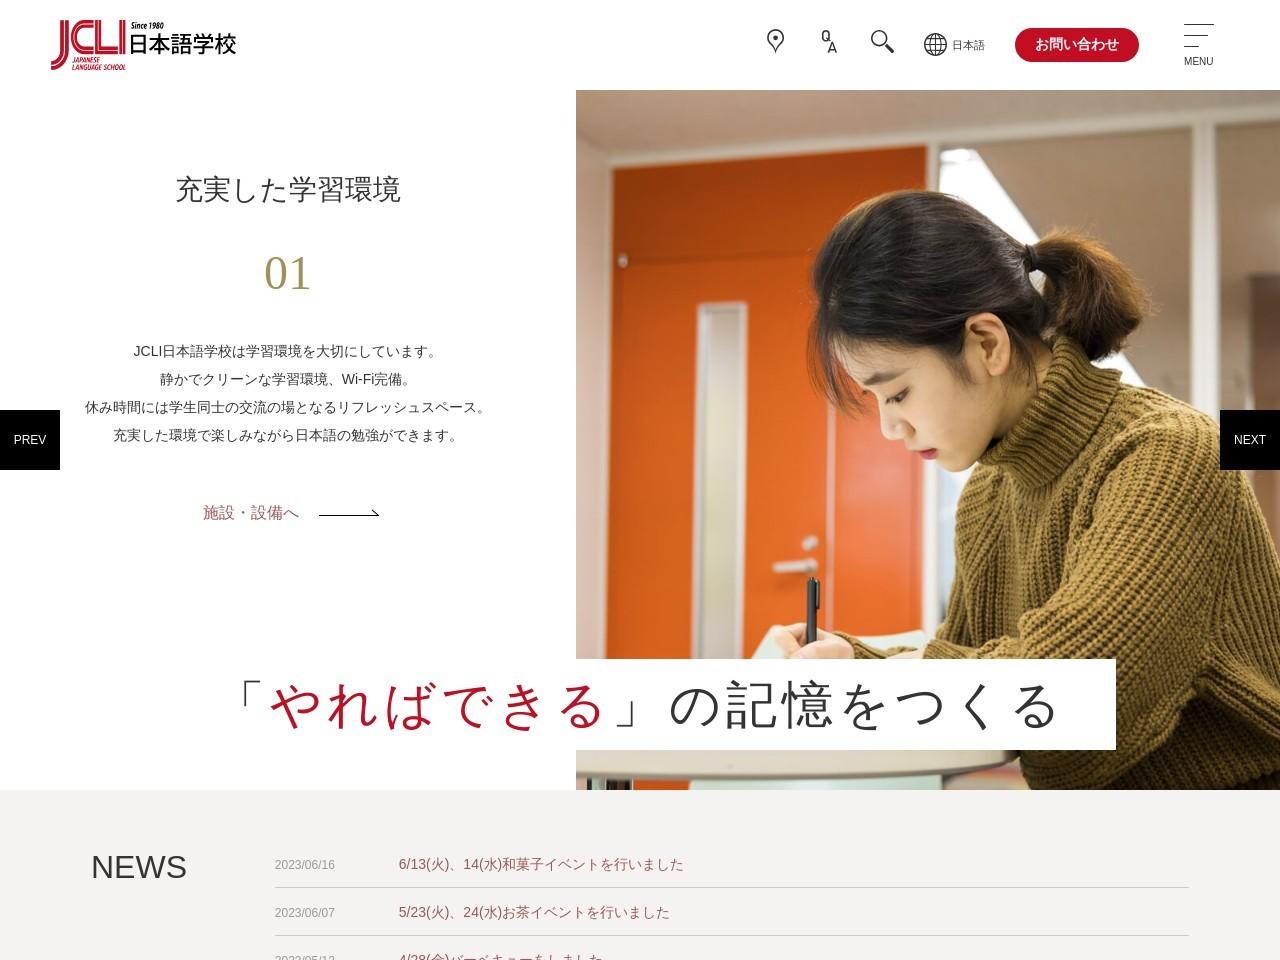 JCLI日本語学校